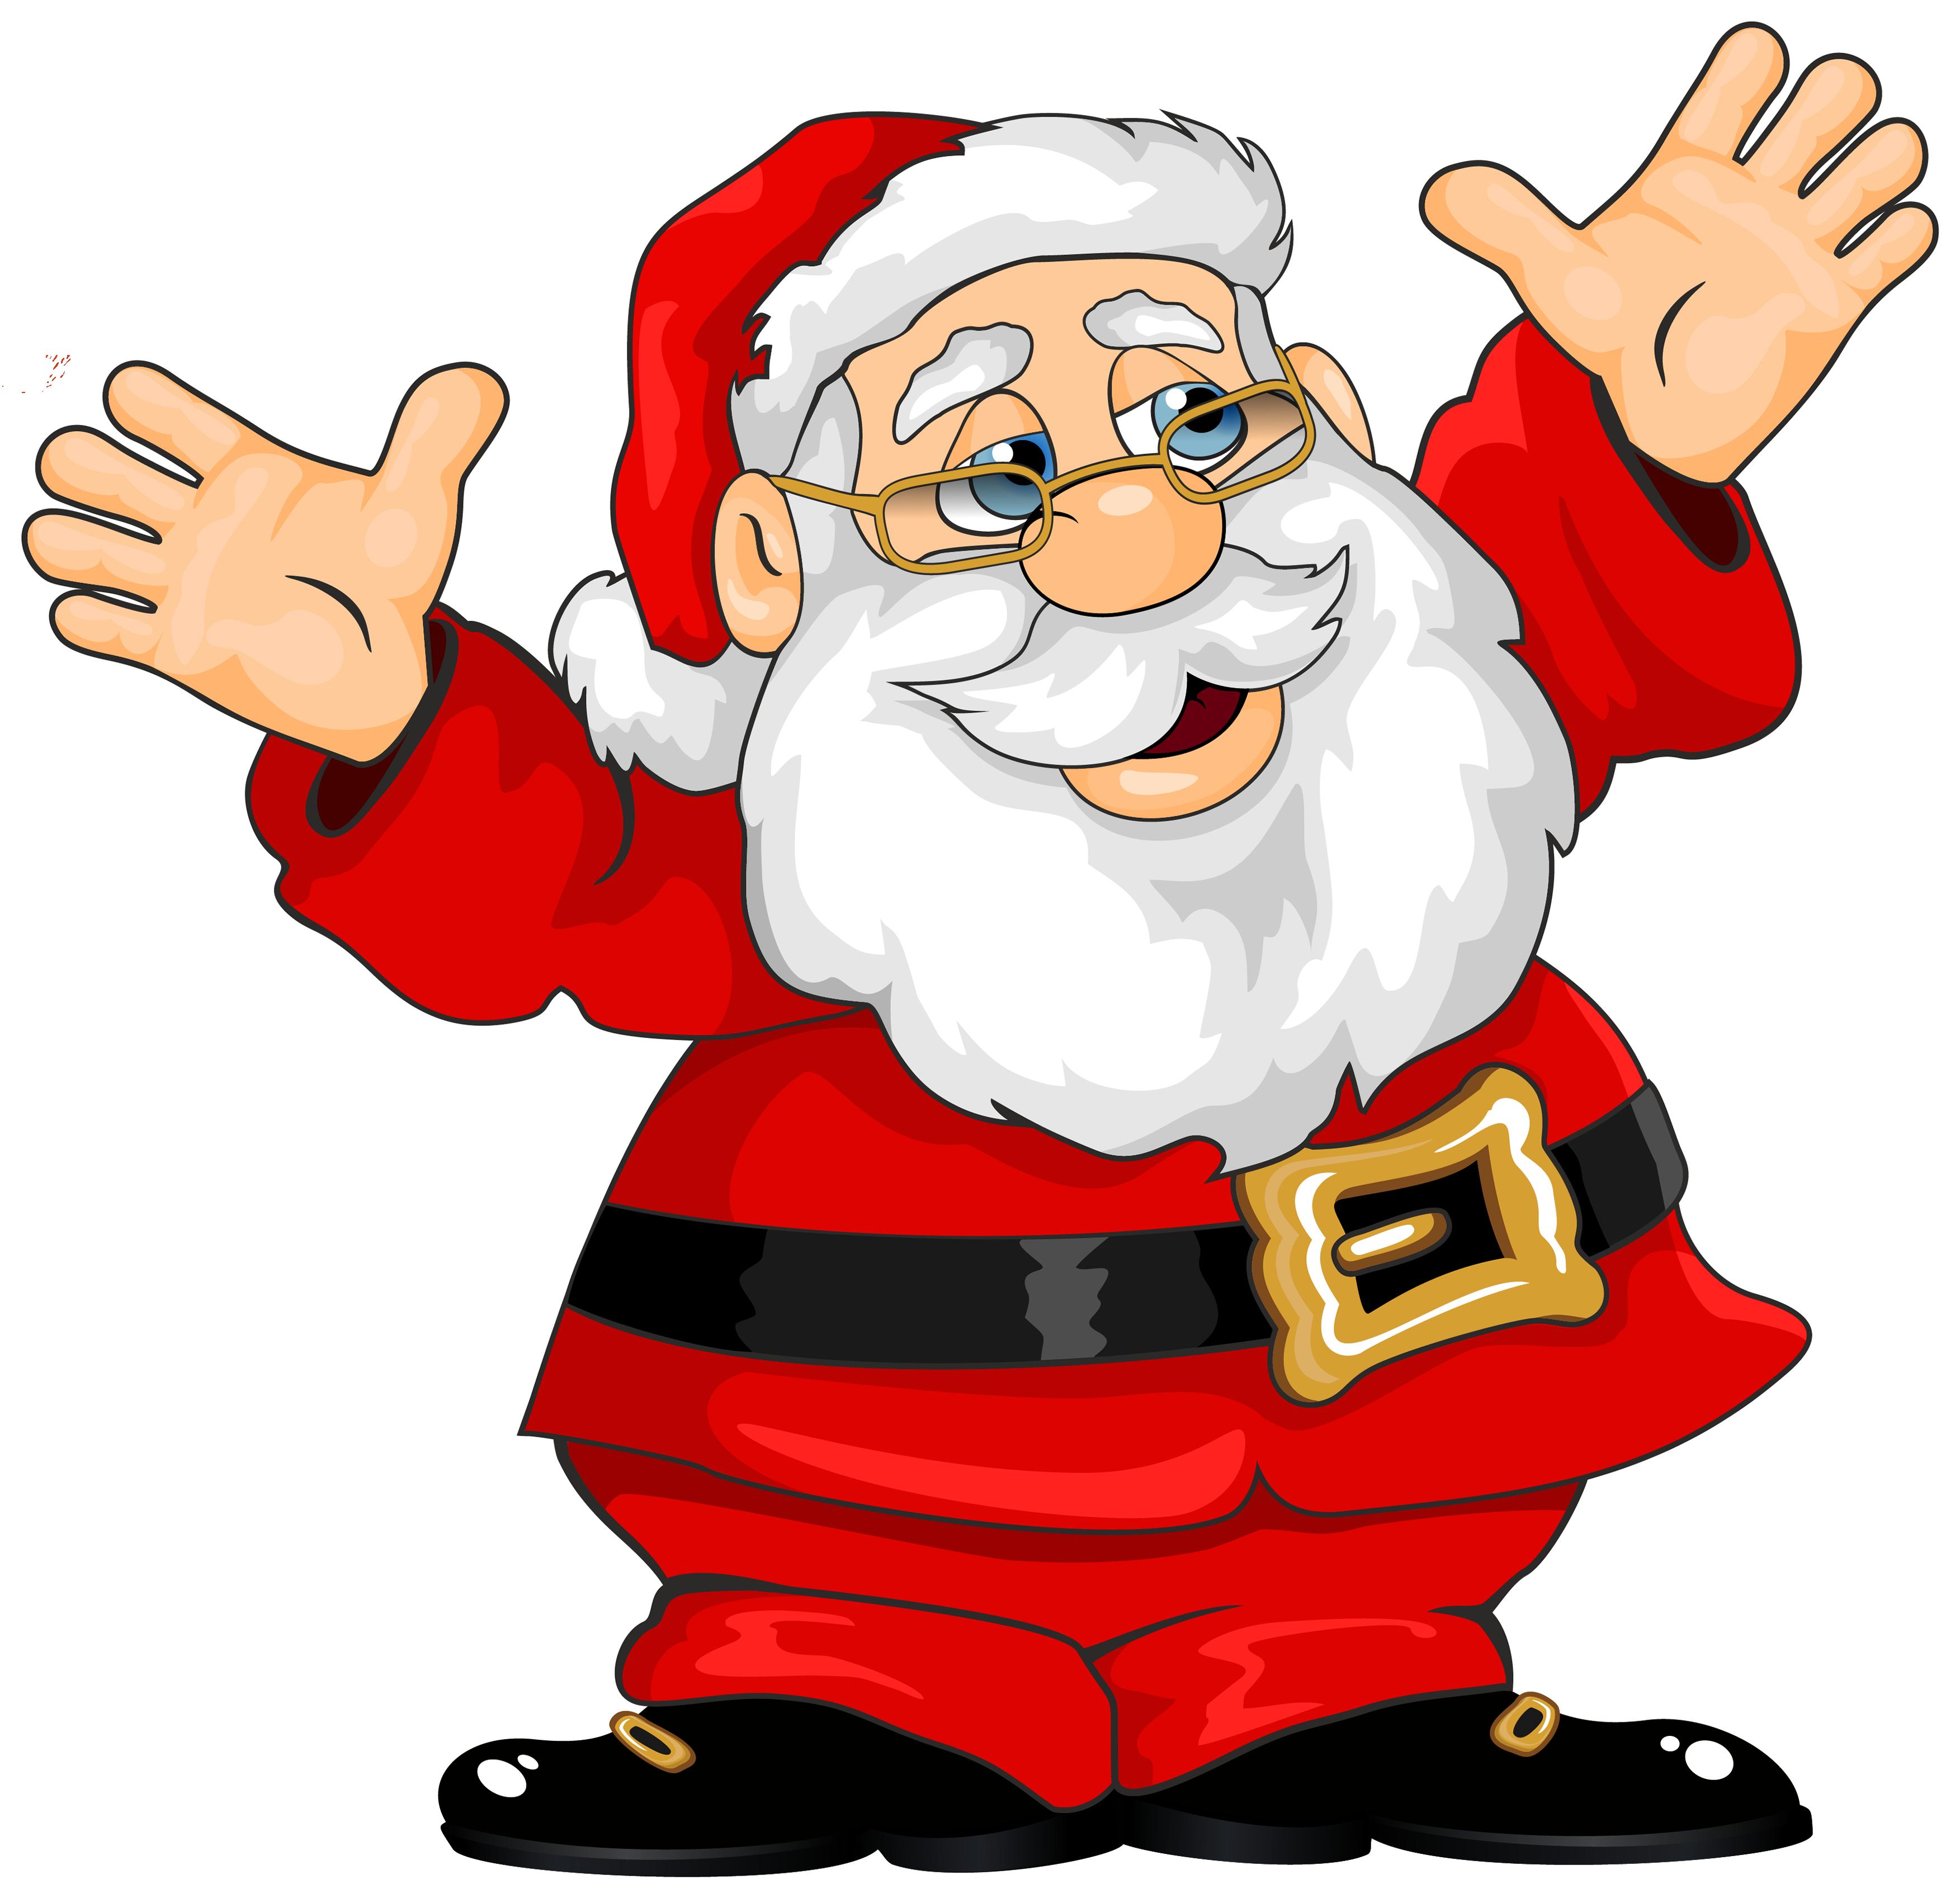 clip royalty free library Santa png image bo. Claus clipart mrs claus.